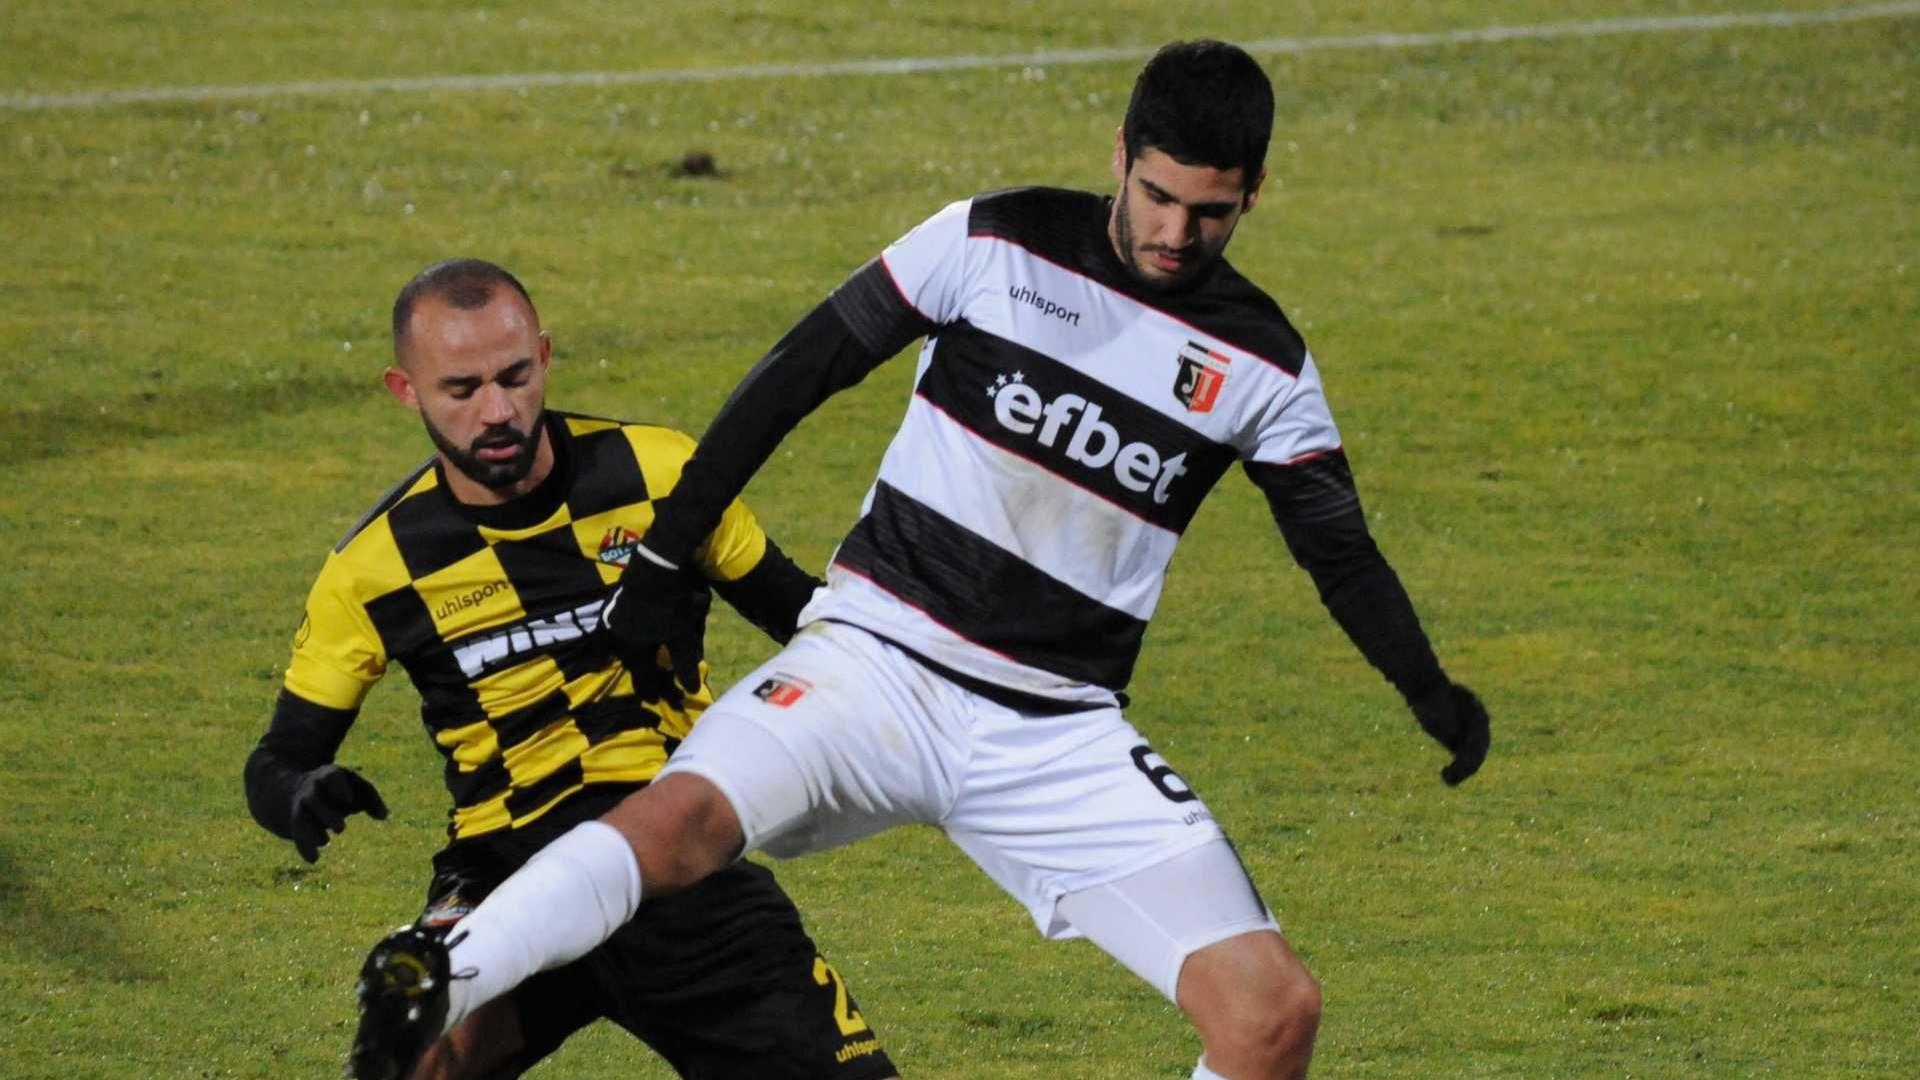 Локомотив и Ботев останаха равни след поредното дерби на Пловдив